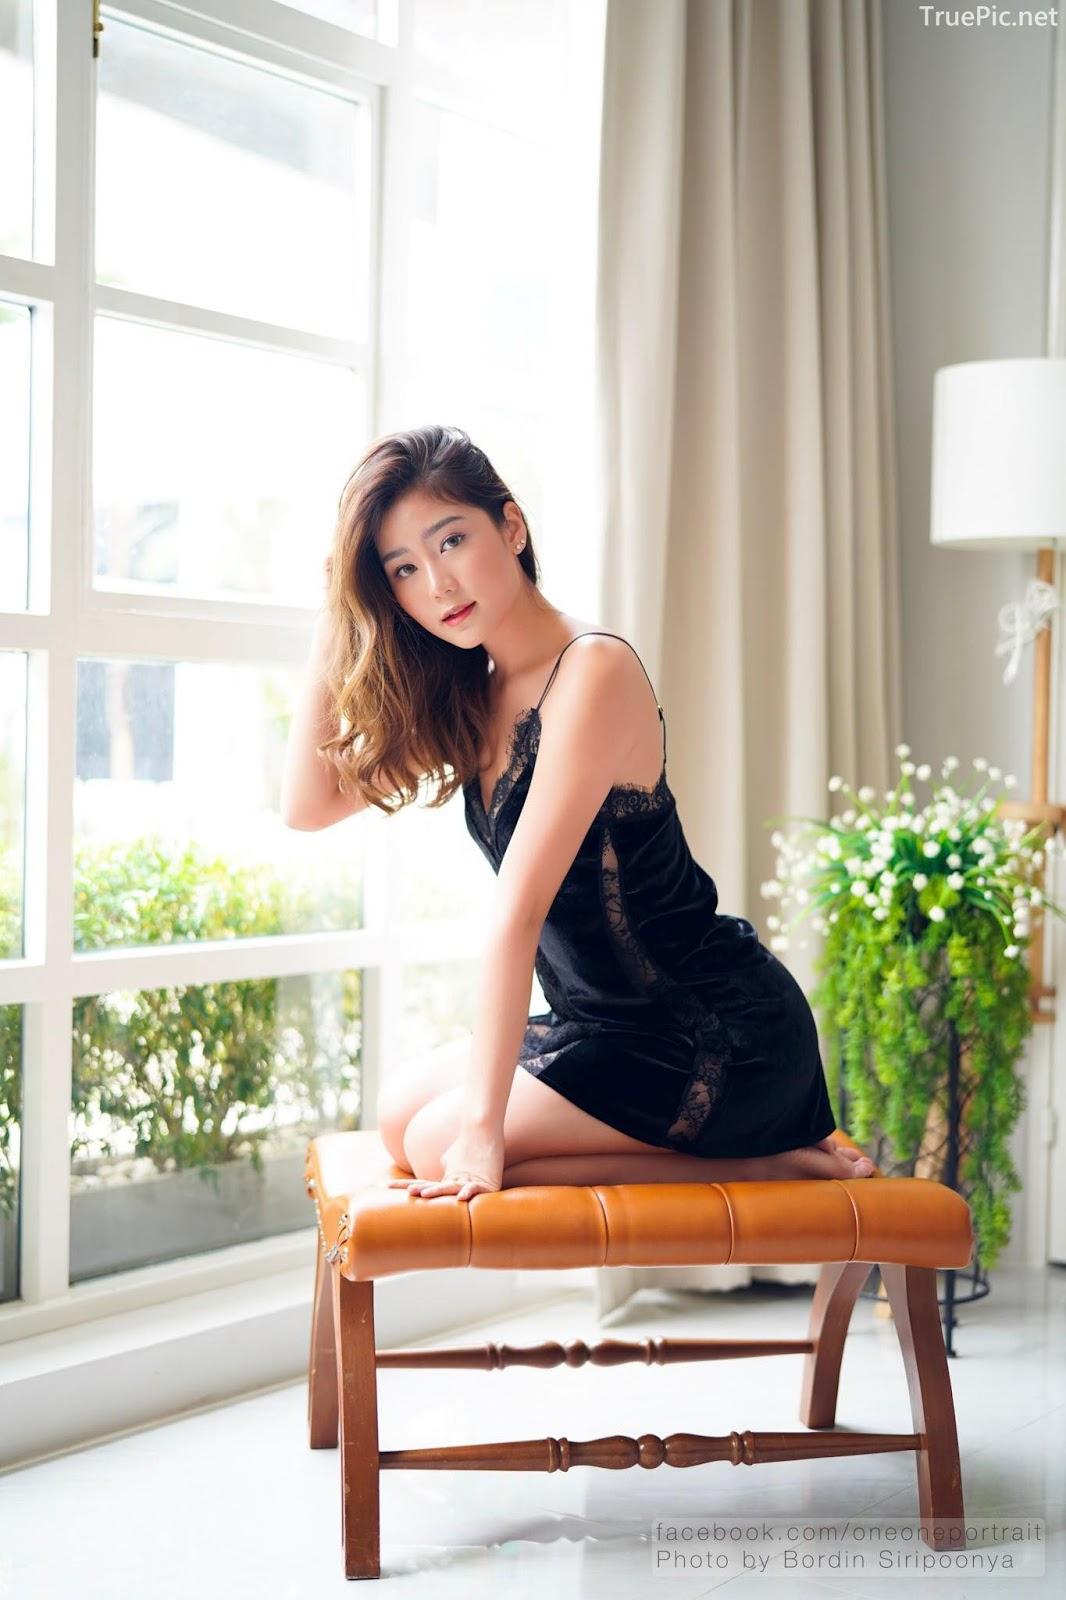 Thailand hot model Pattaravadee Boonmeesup vs Photo album Black Magic Sleepwear - Picture 9